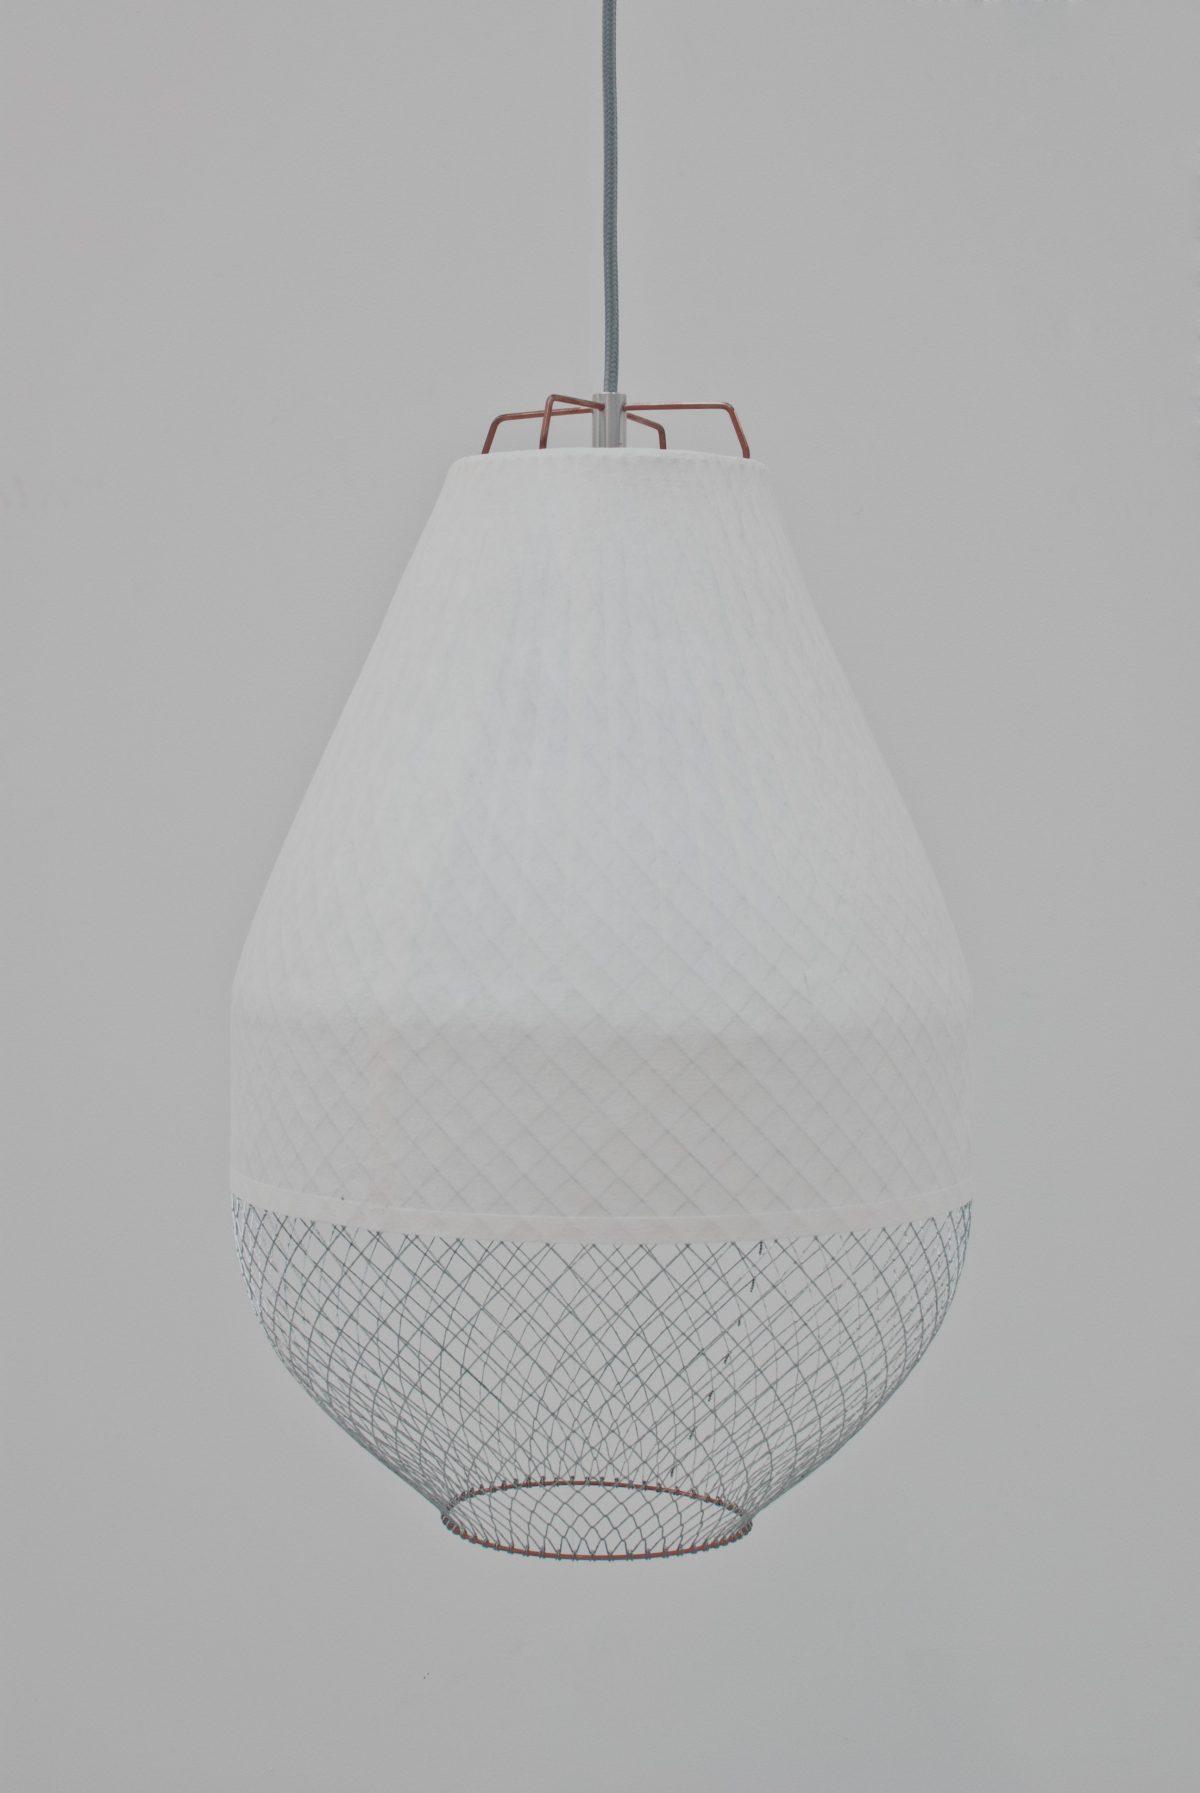 Open Meshmatics lamp off byRickTegelaar – Gimmii